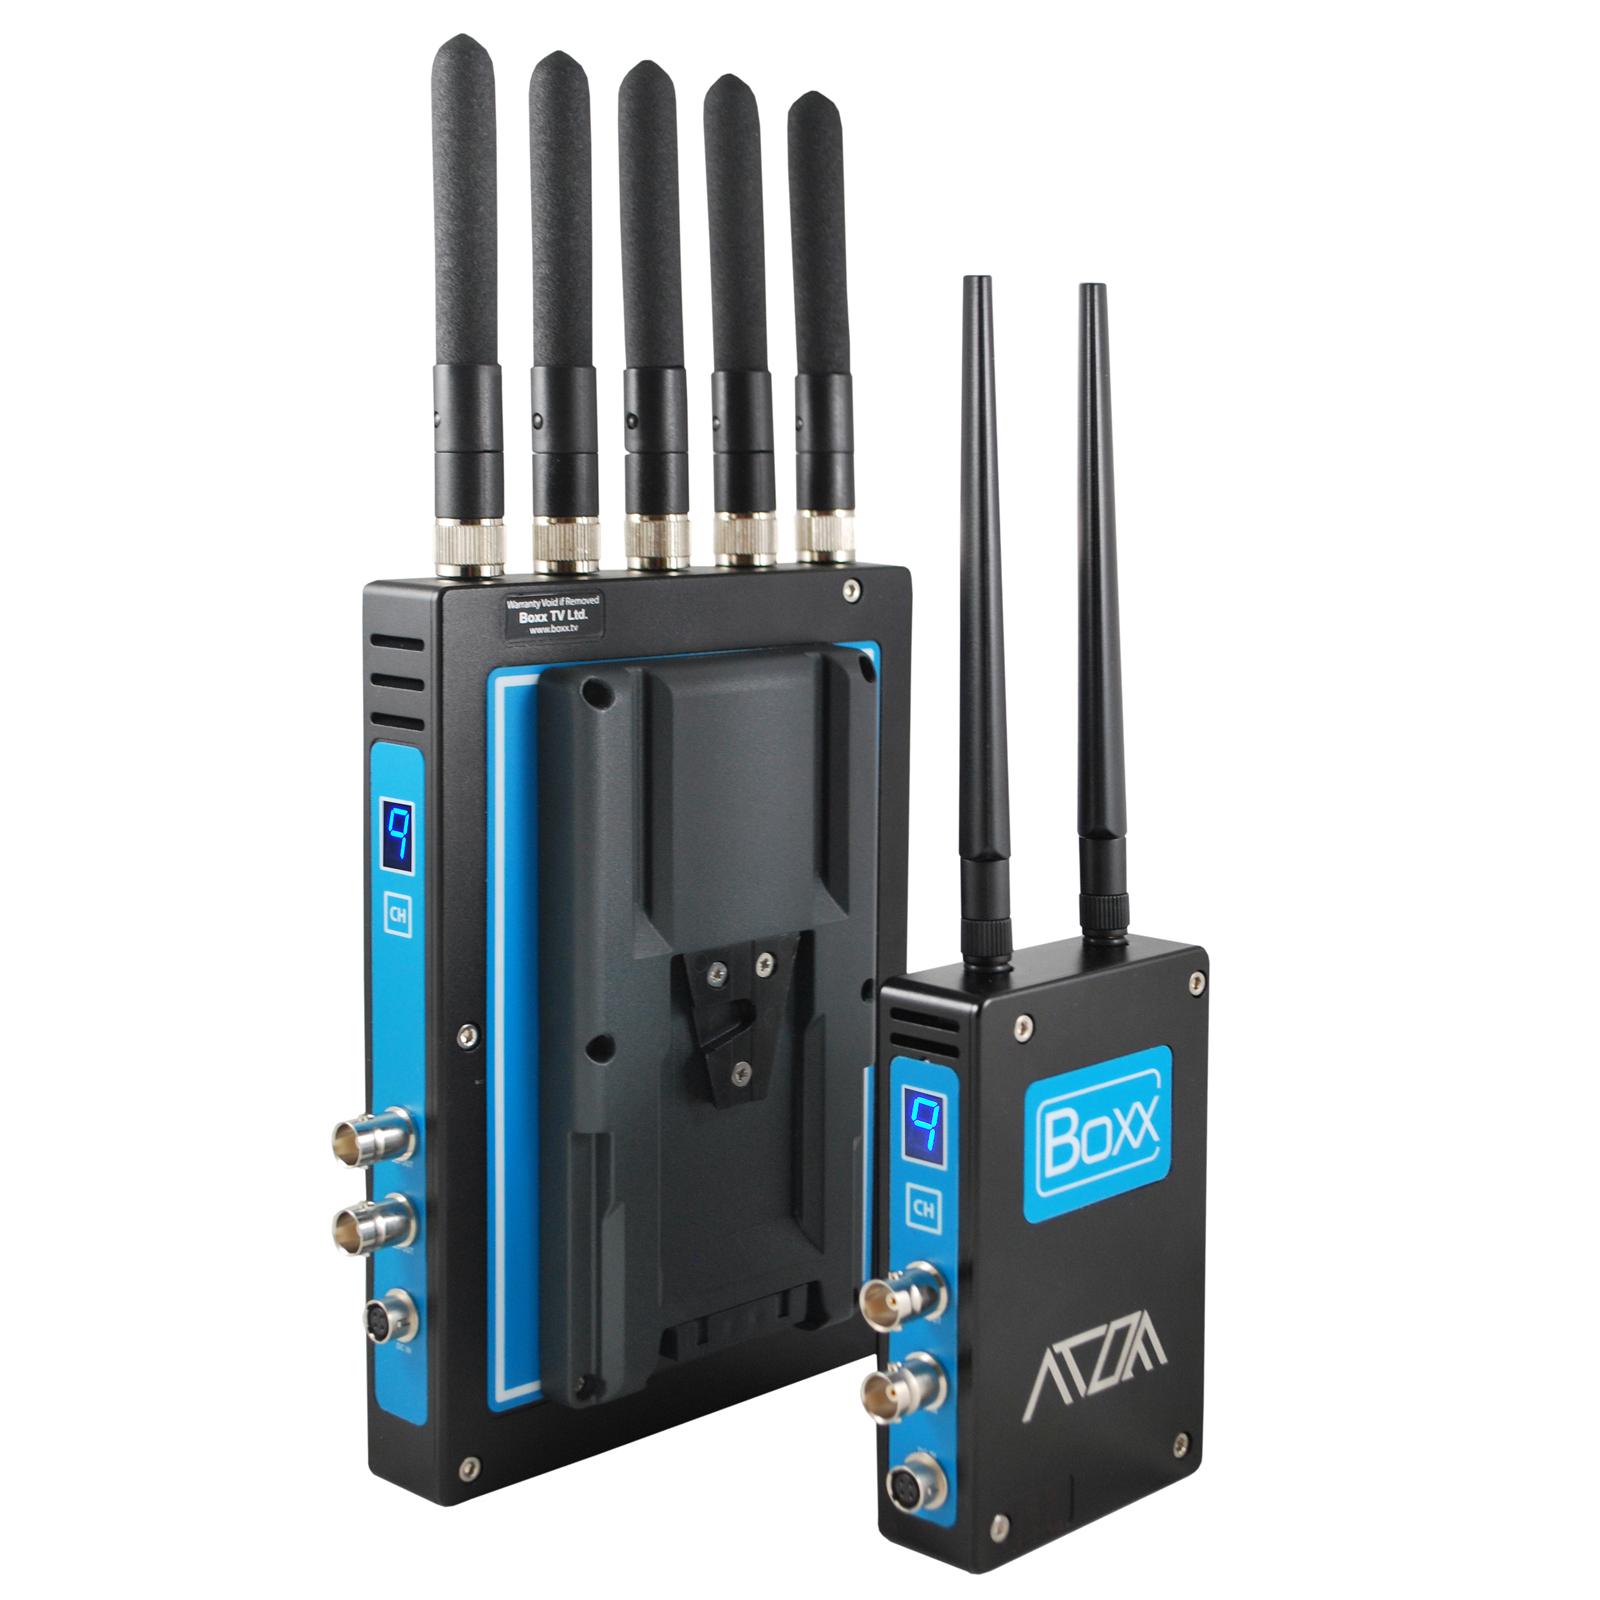 Boxx Atom Wireless Video Transmitter HD 1